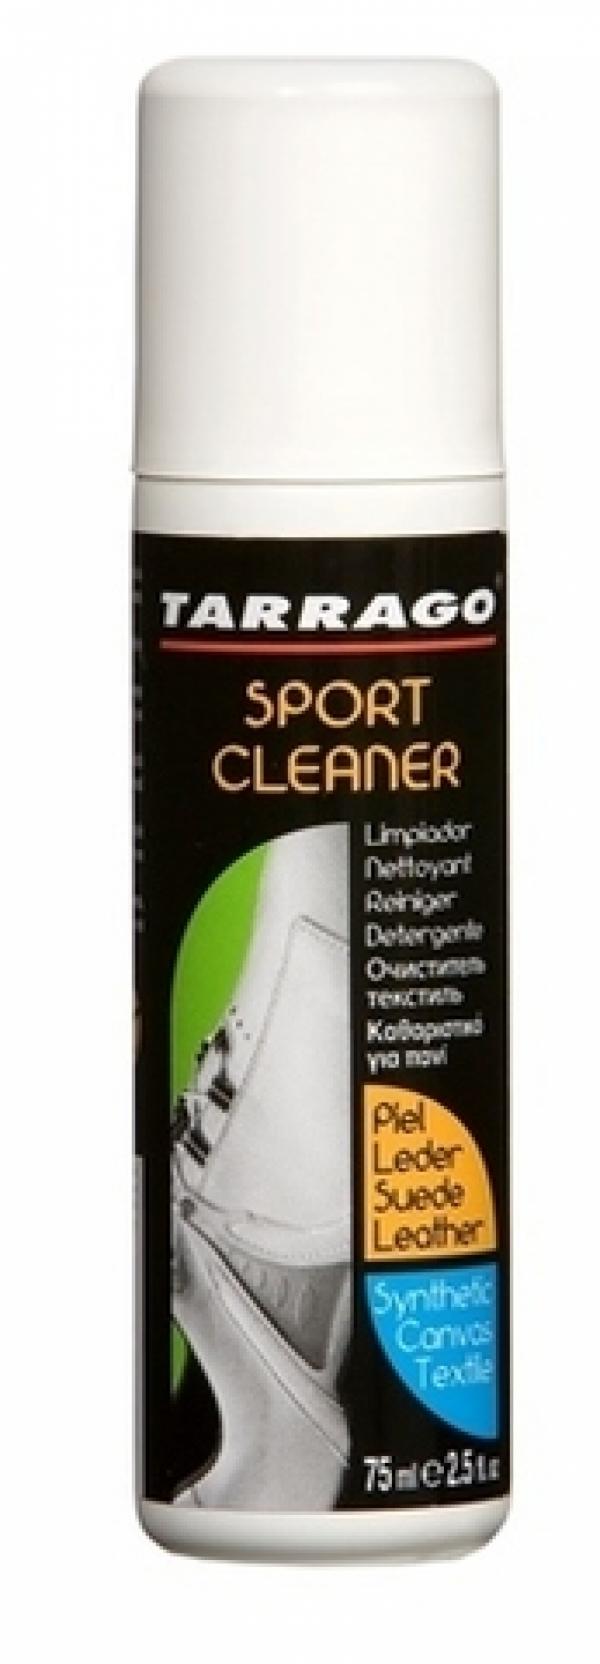 Очиститель для спорт. обуви TSA17 Tarrago SPORT CLEANER, 75мл.